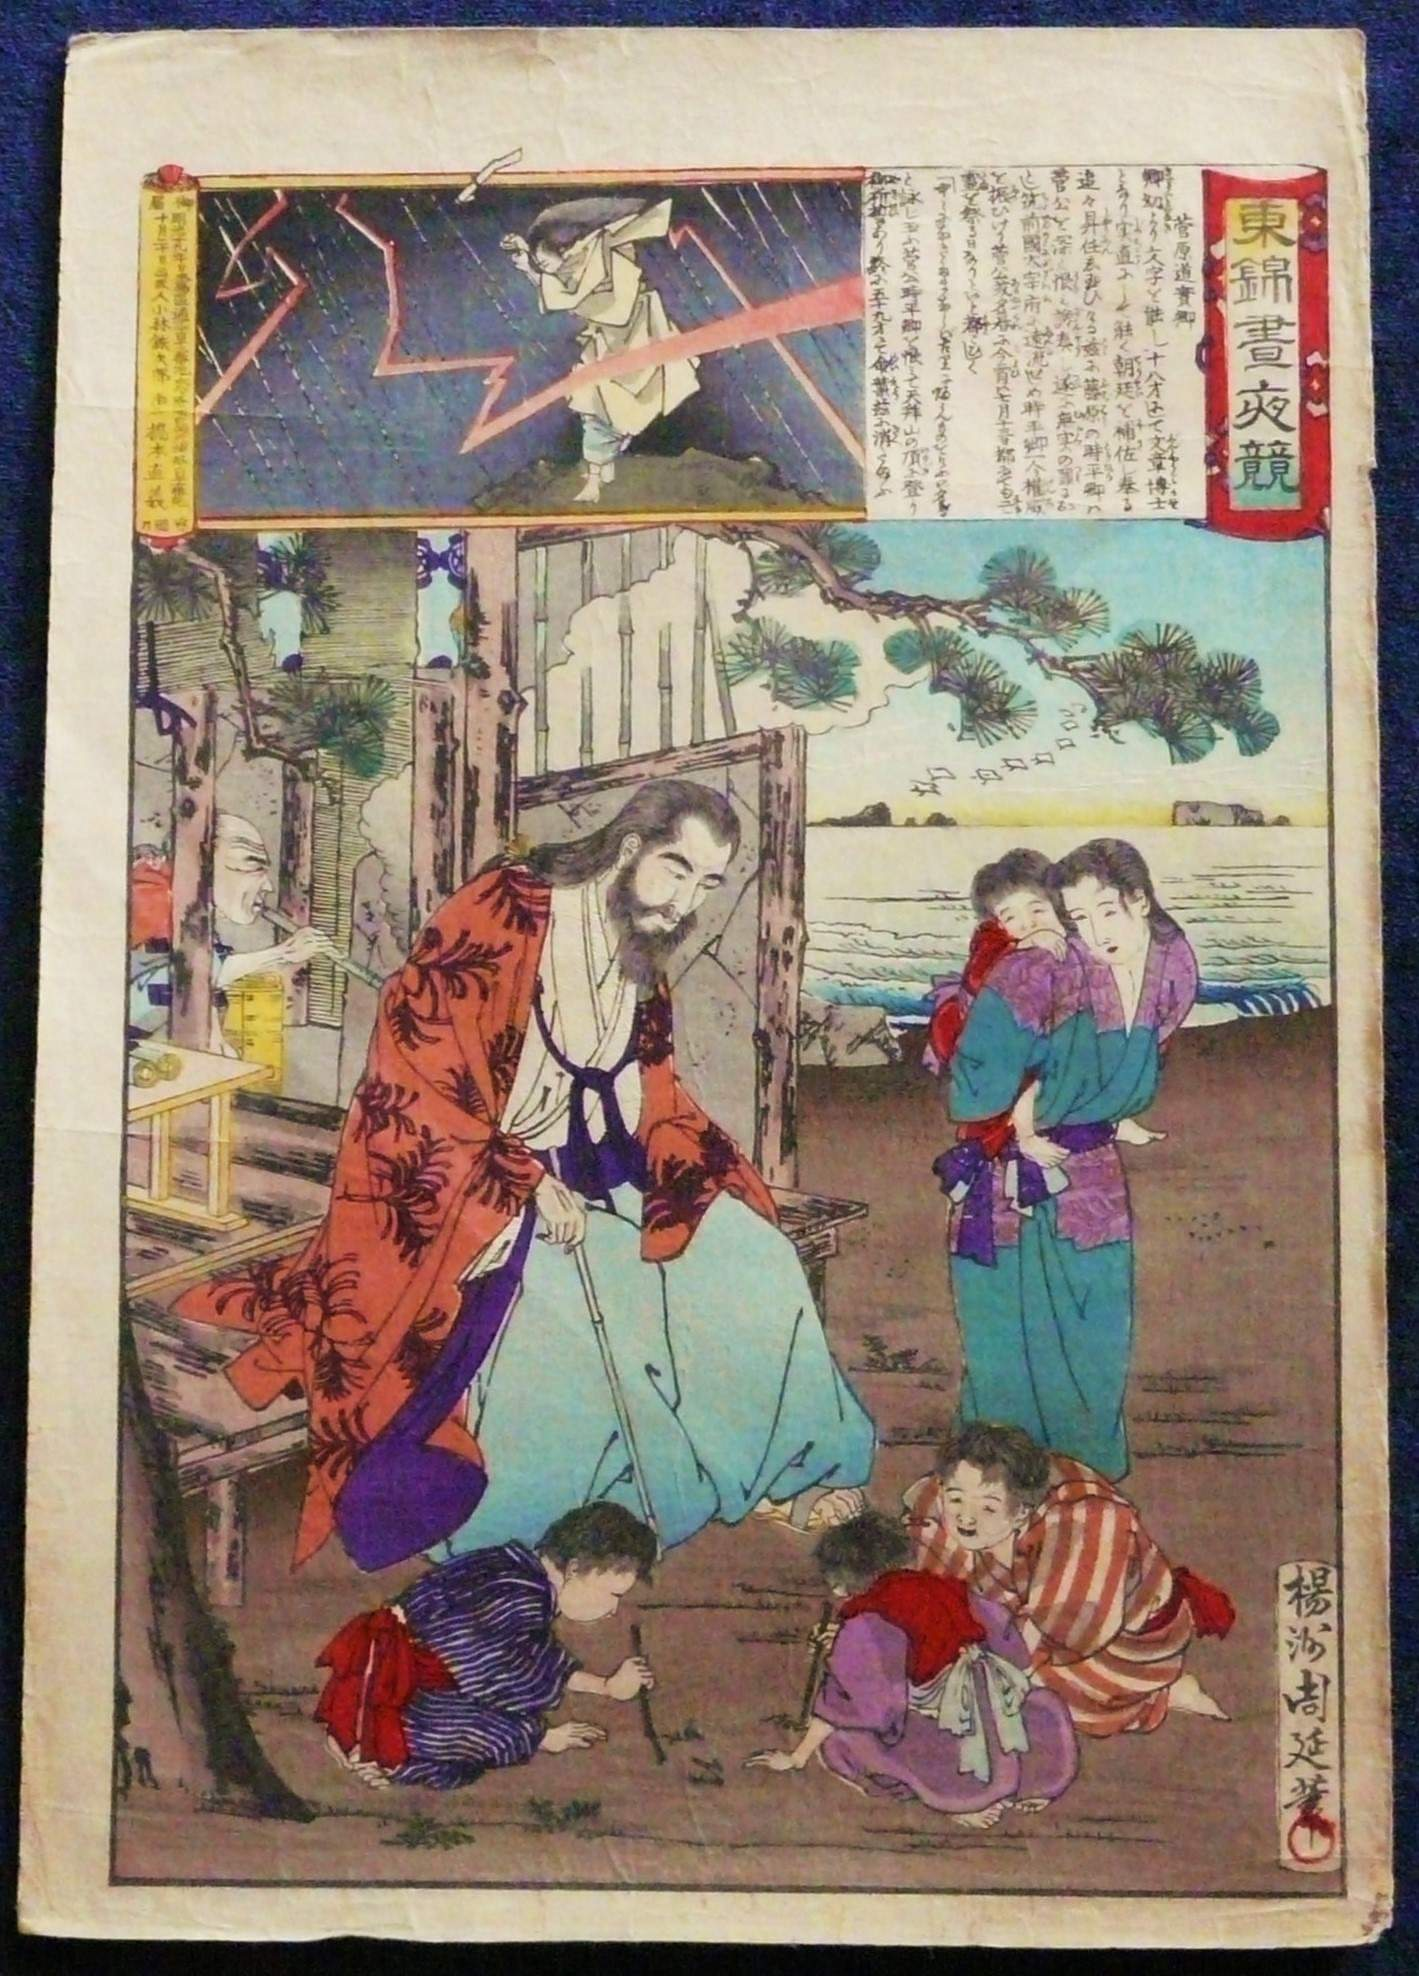 HASHIMOTO CHIKANOBU: #P3839 FIRST EDITION (1886)